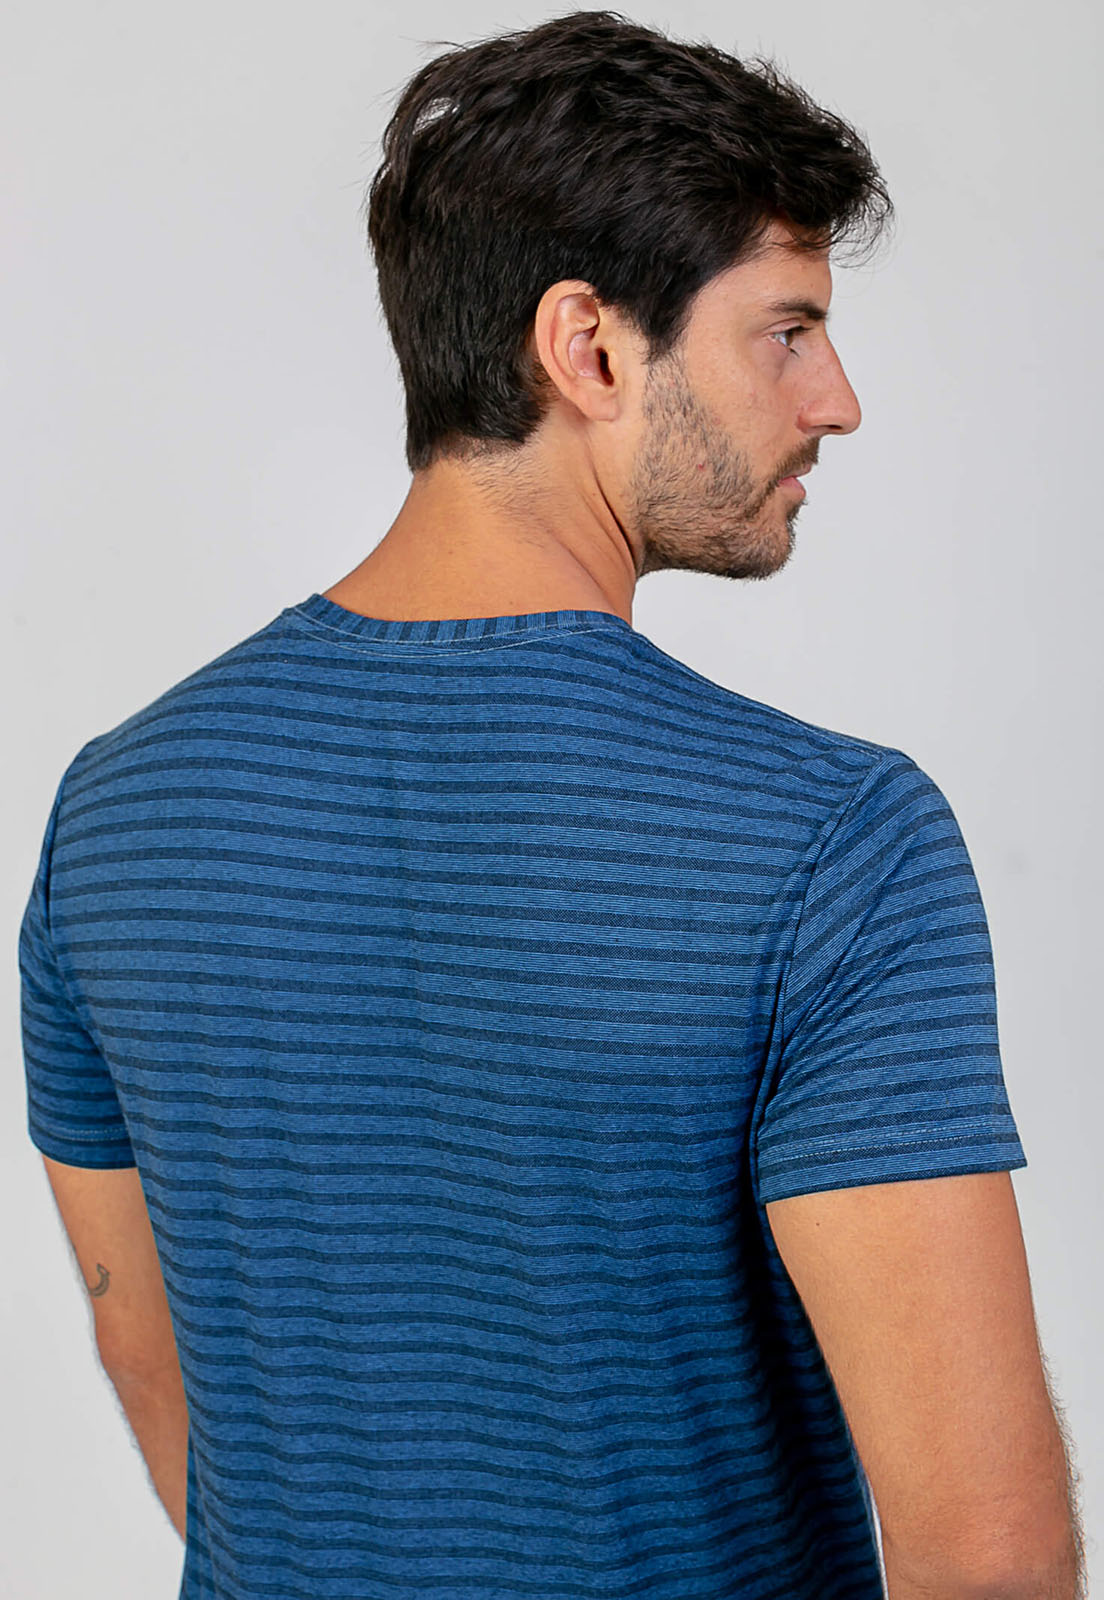 T-Shirt Postinho melty  - melty surf & Co.